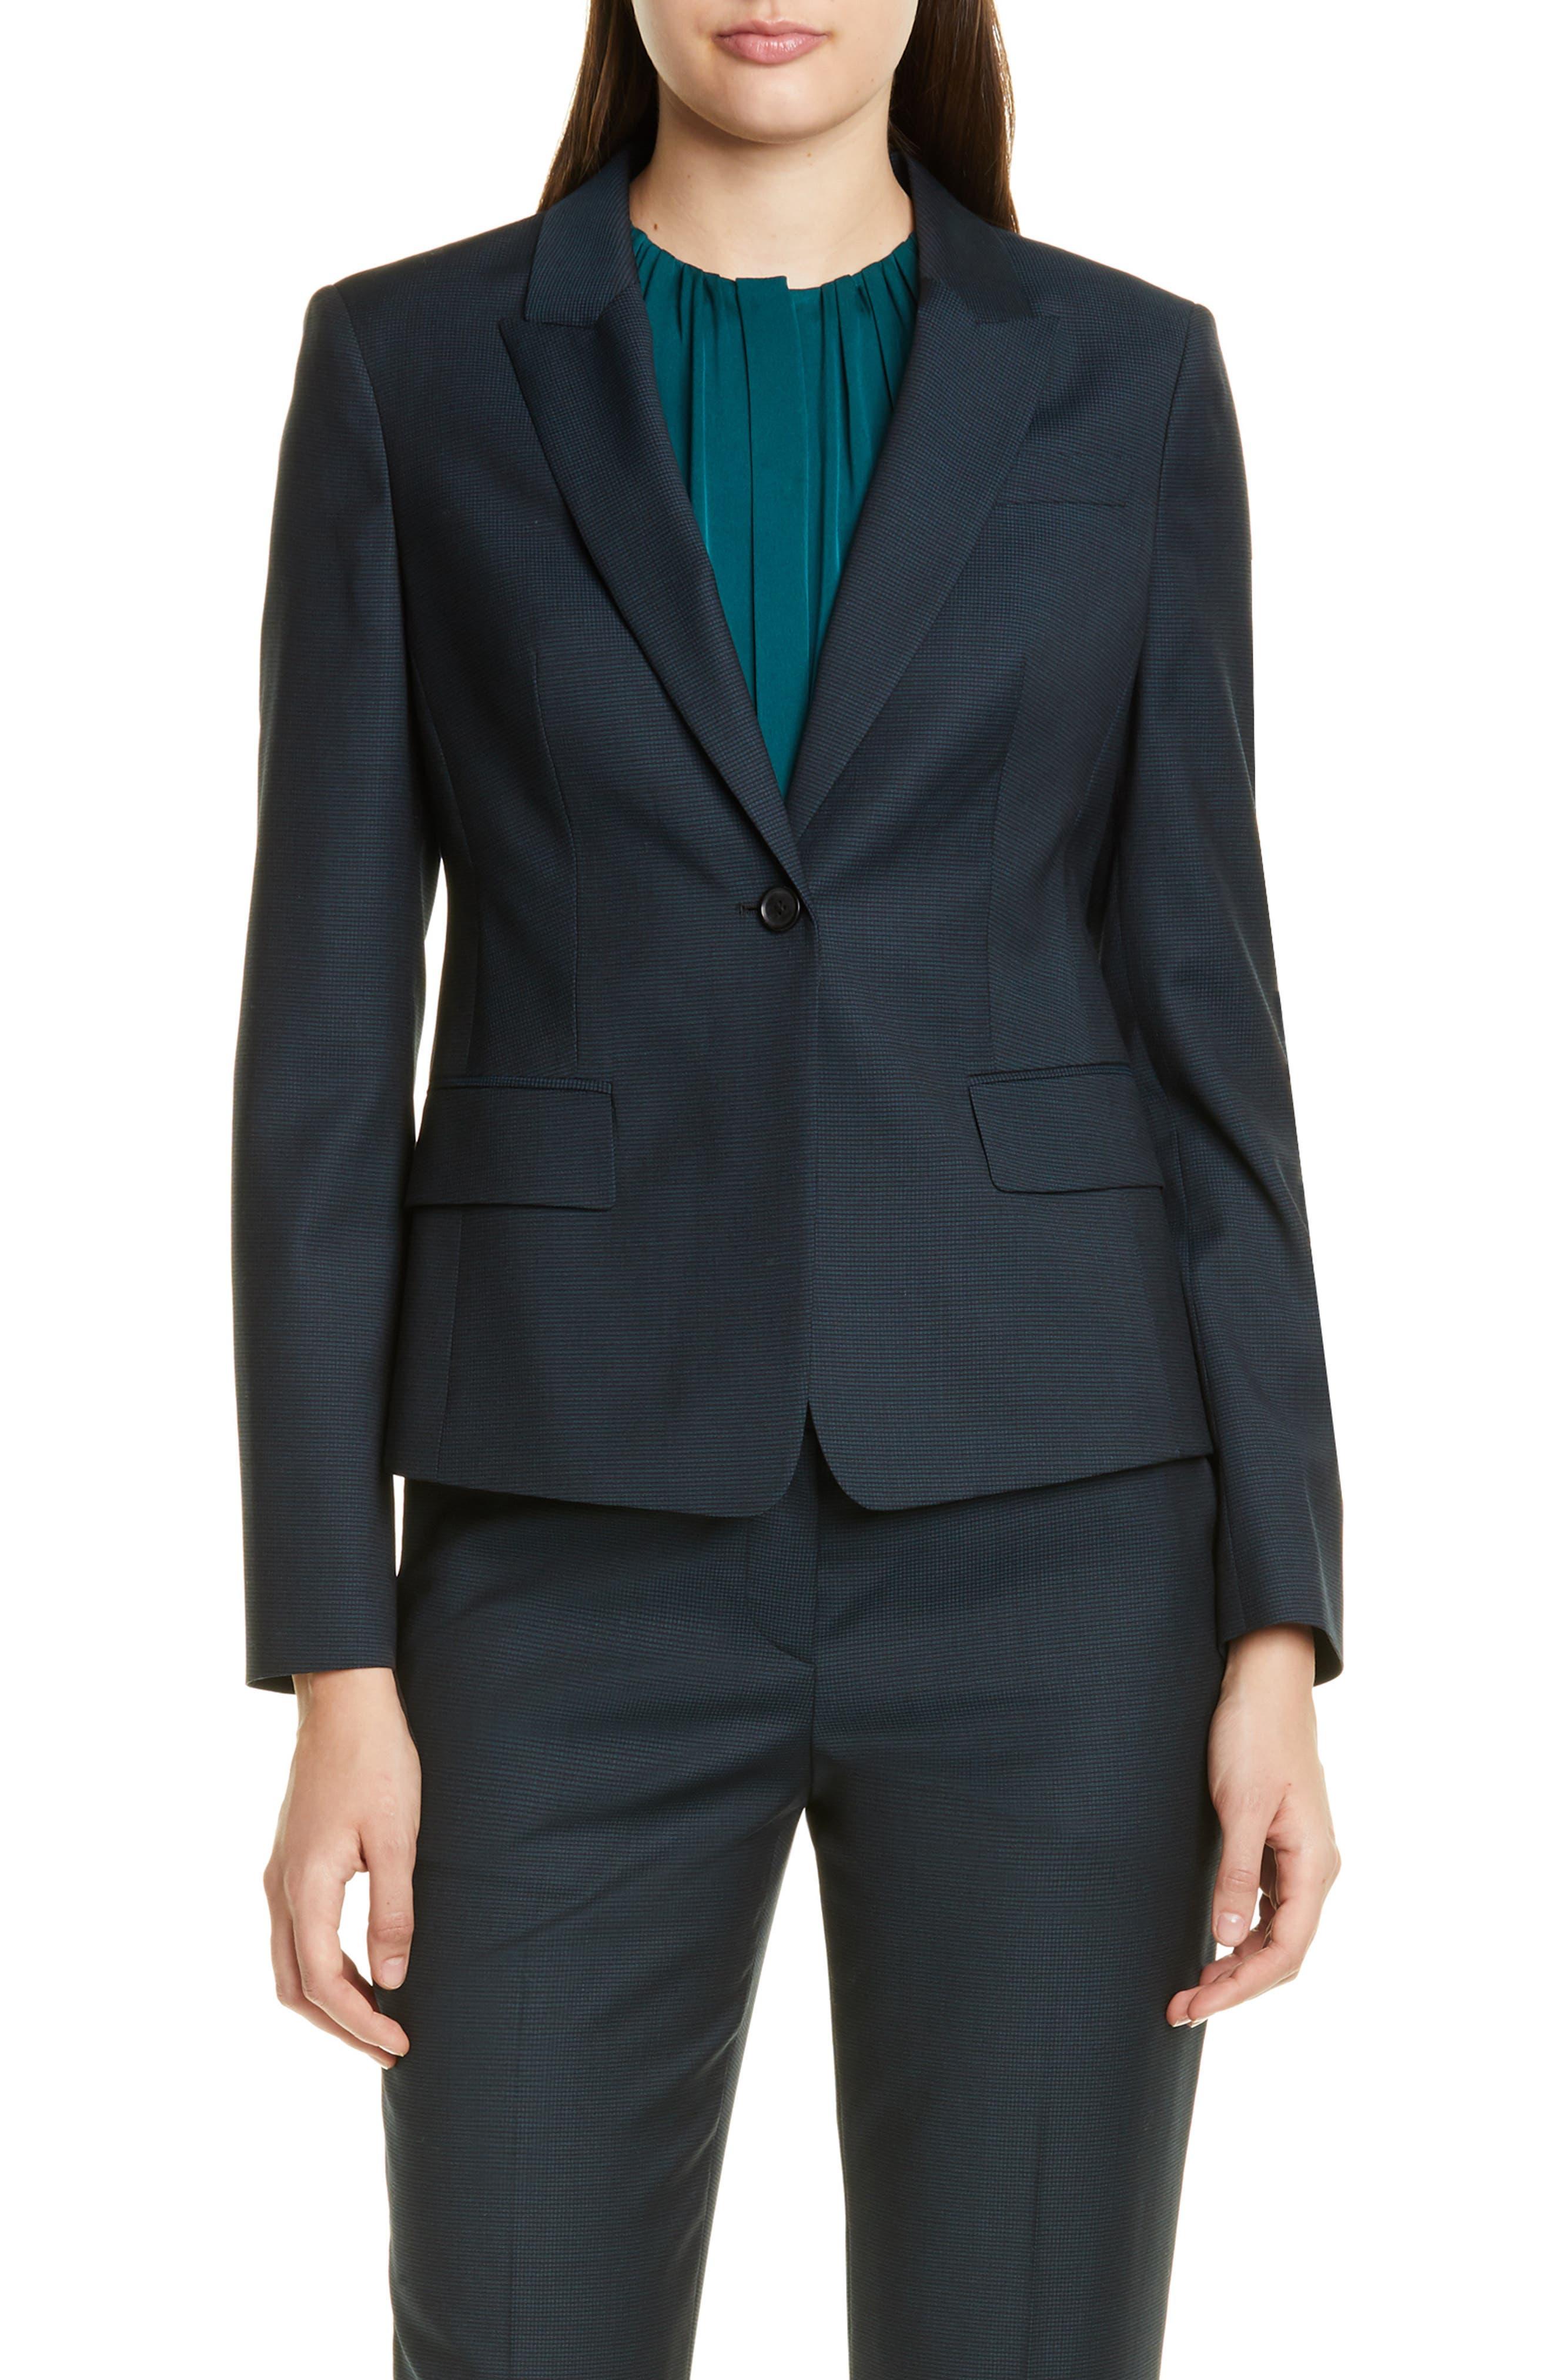 BOSS Jibalena Microcheck Wool Suit Jacket (Regular & Petite)